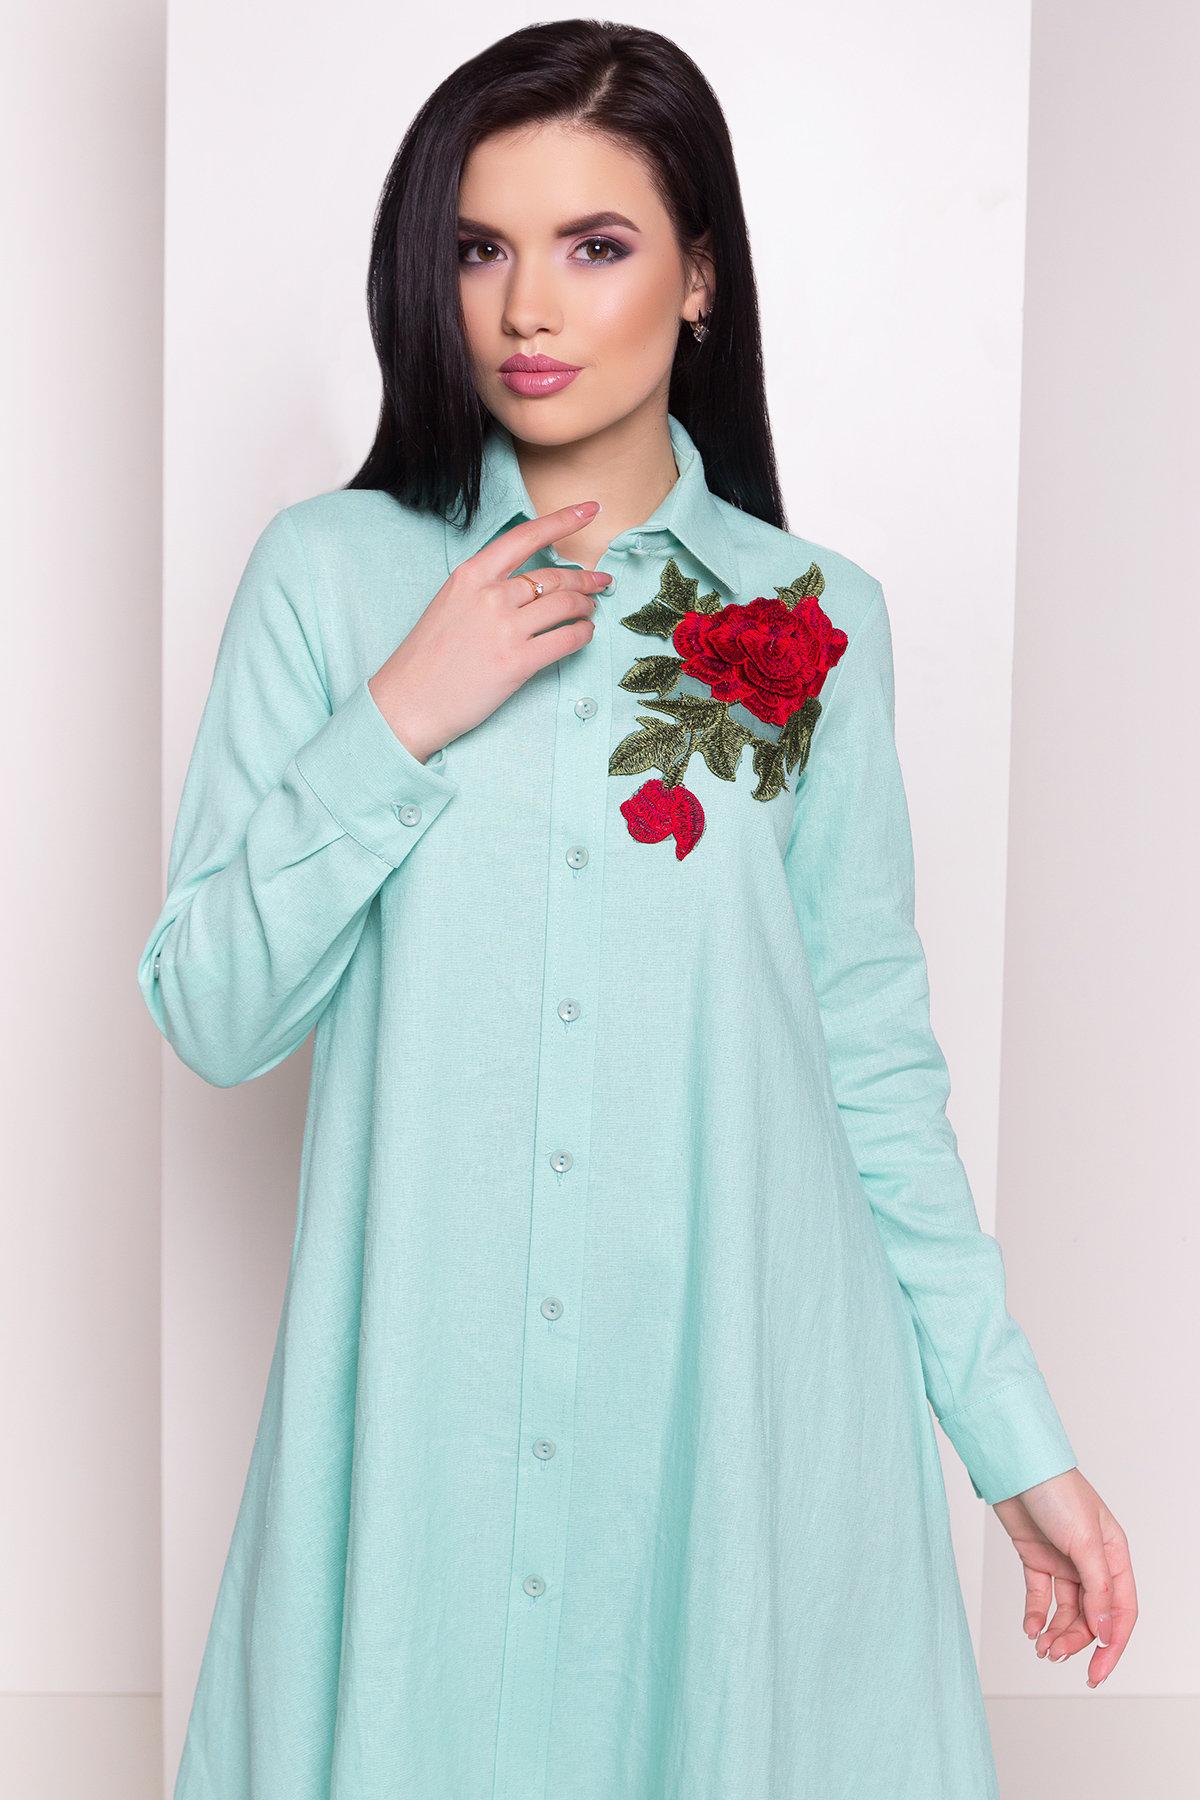 Платье Бри 2706 АРТ. 34088 Цвет: Мята - фото 3, интернет магазин tm-modus.ru